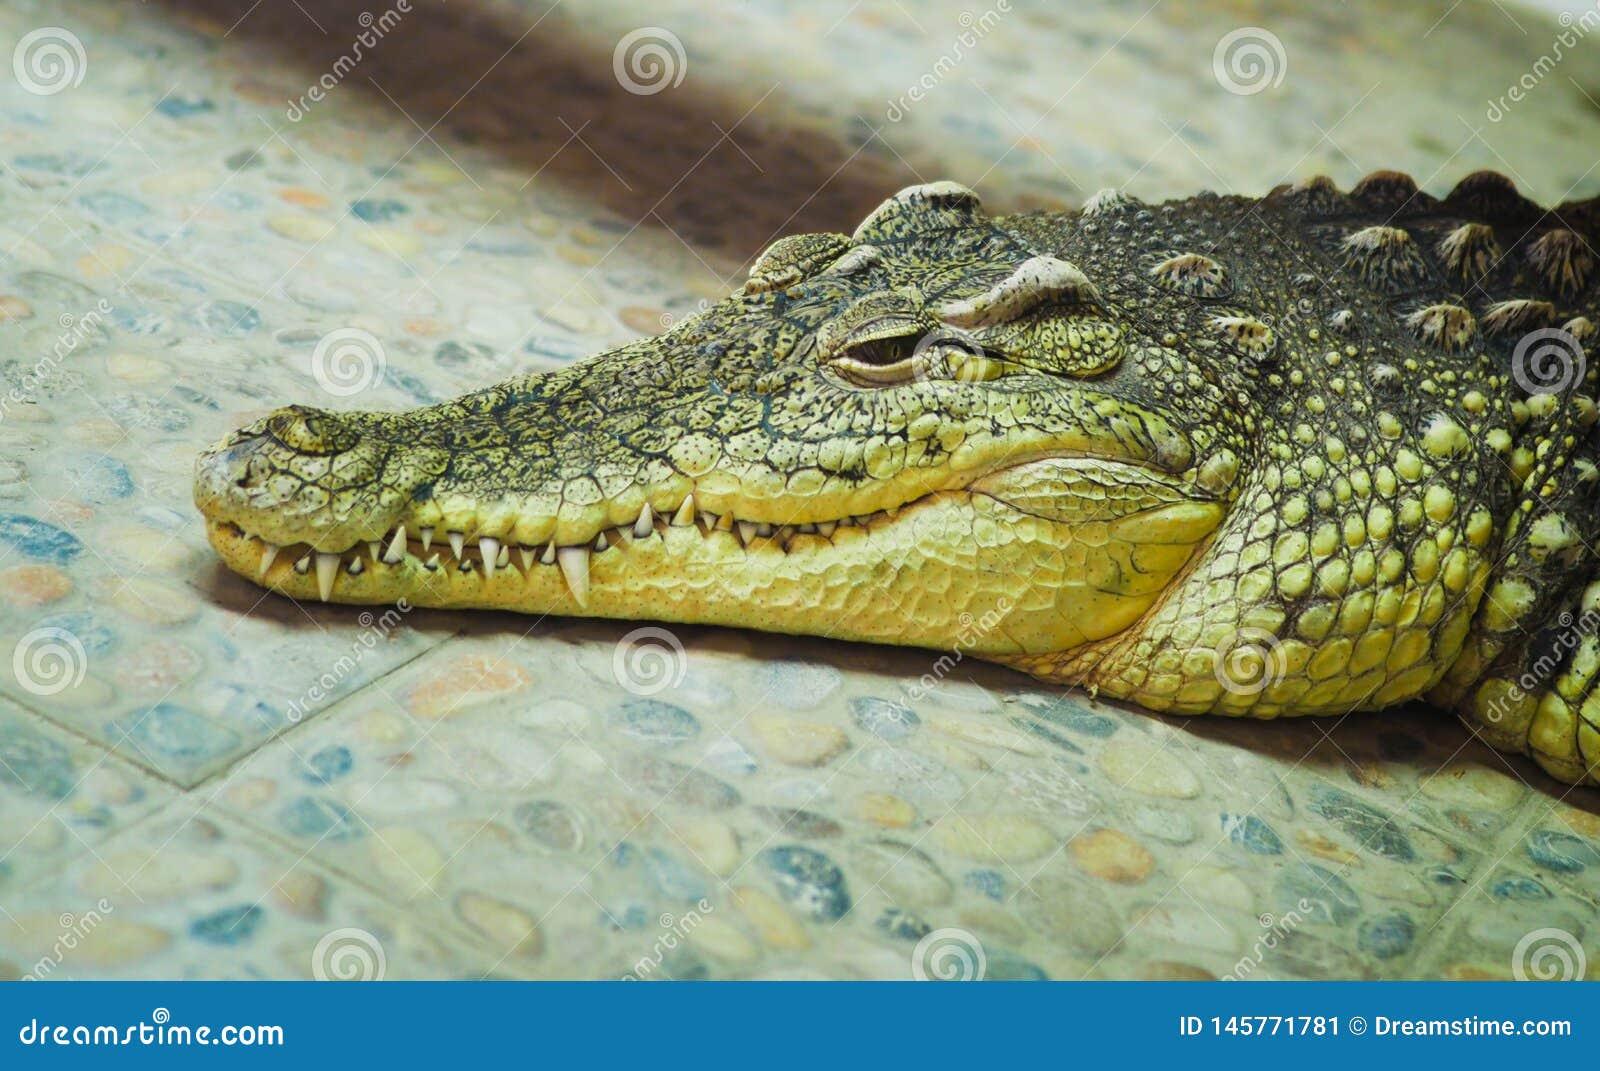 Sad crocodile lying n